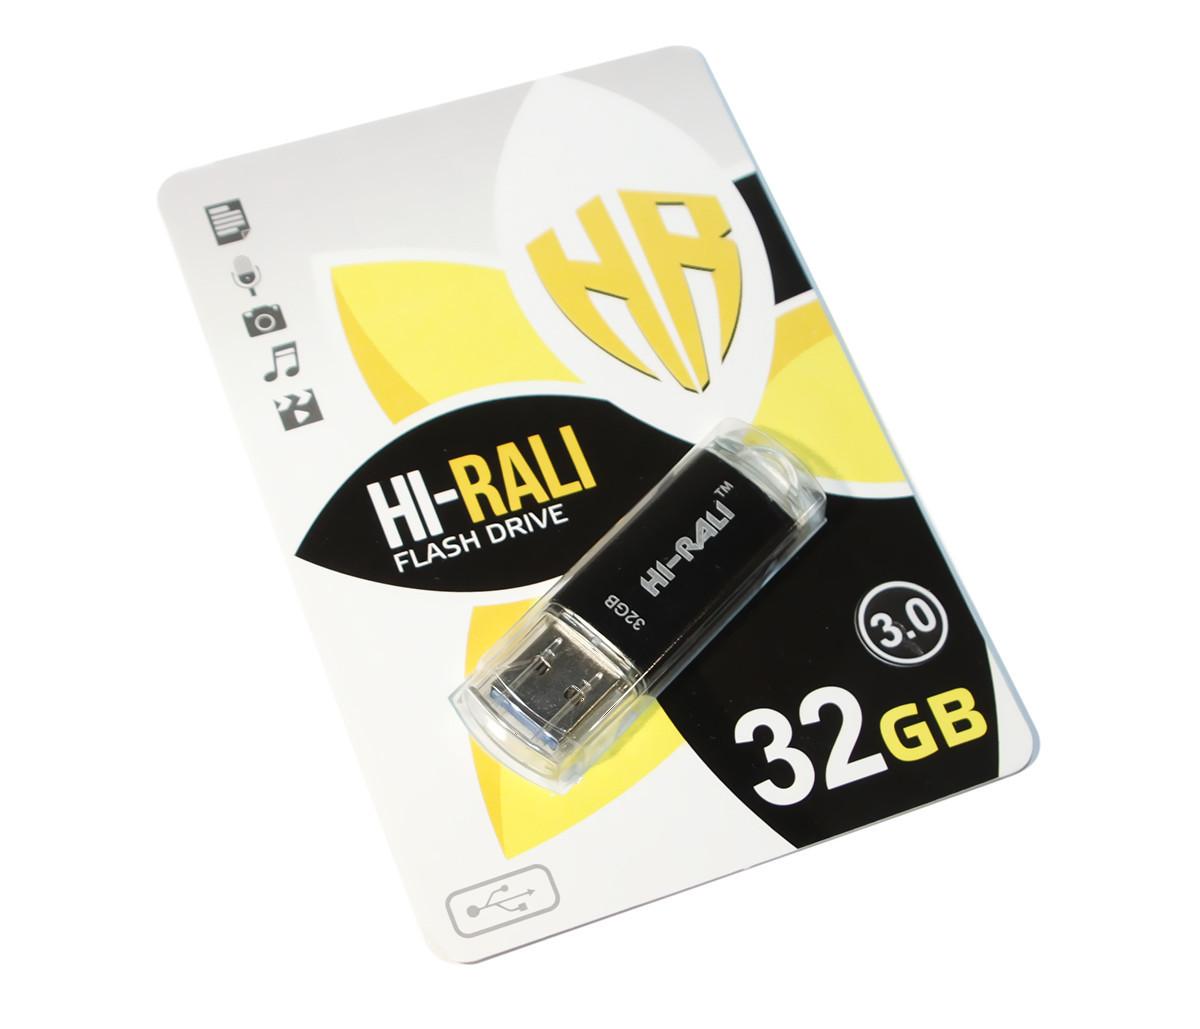 Флешка USB 3.0 32 Gb Hi-Rali Rocket series Black, HI-32 Gb3VCBK